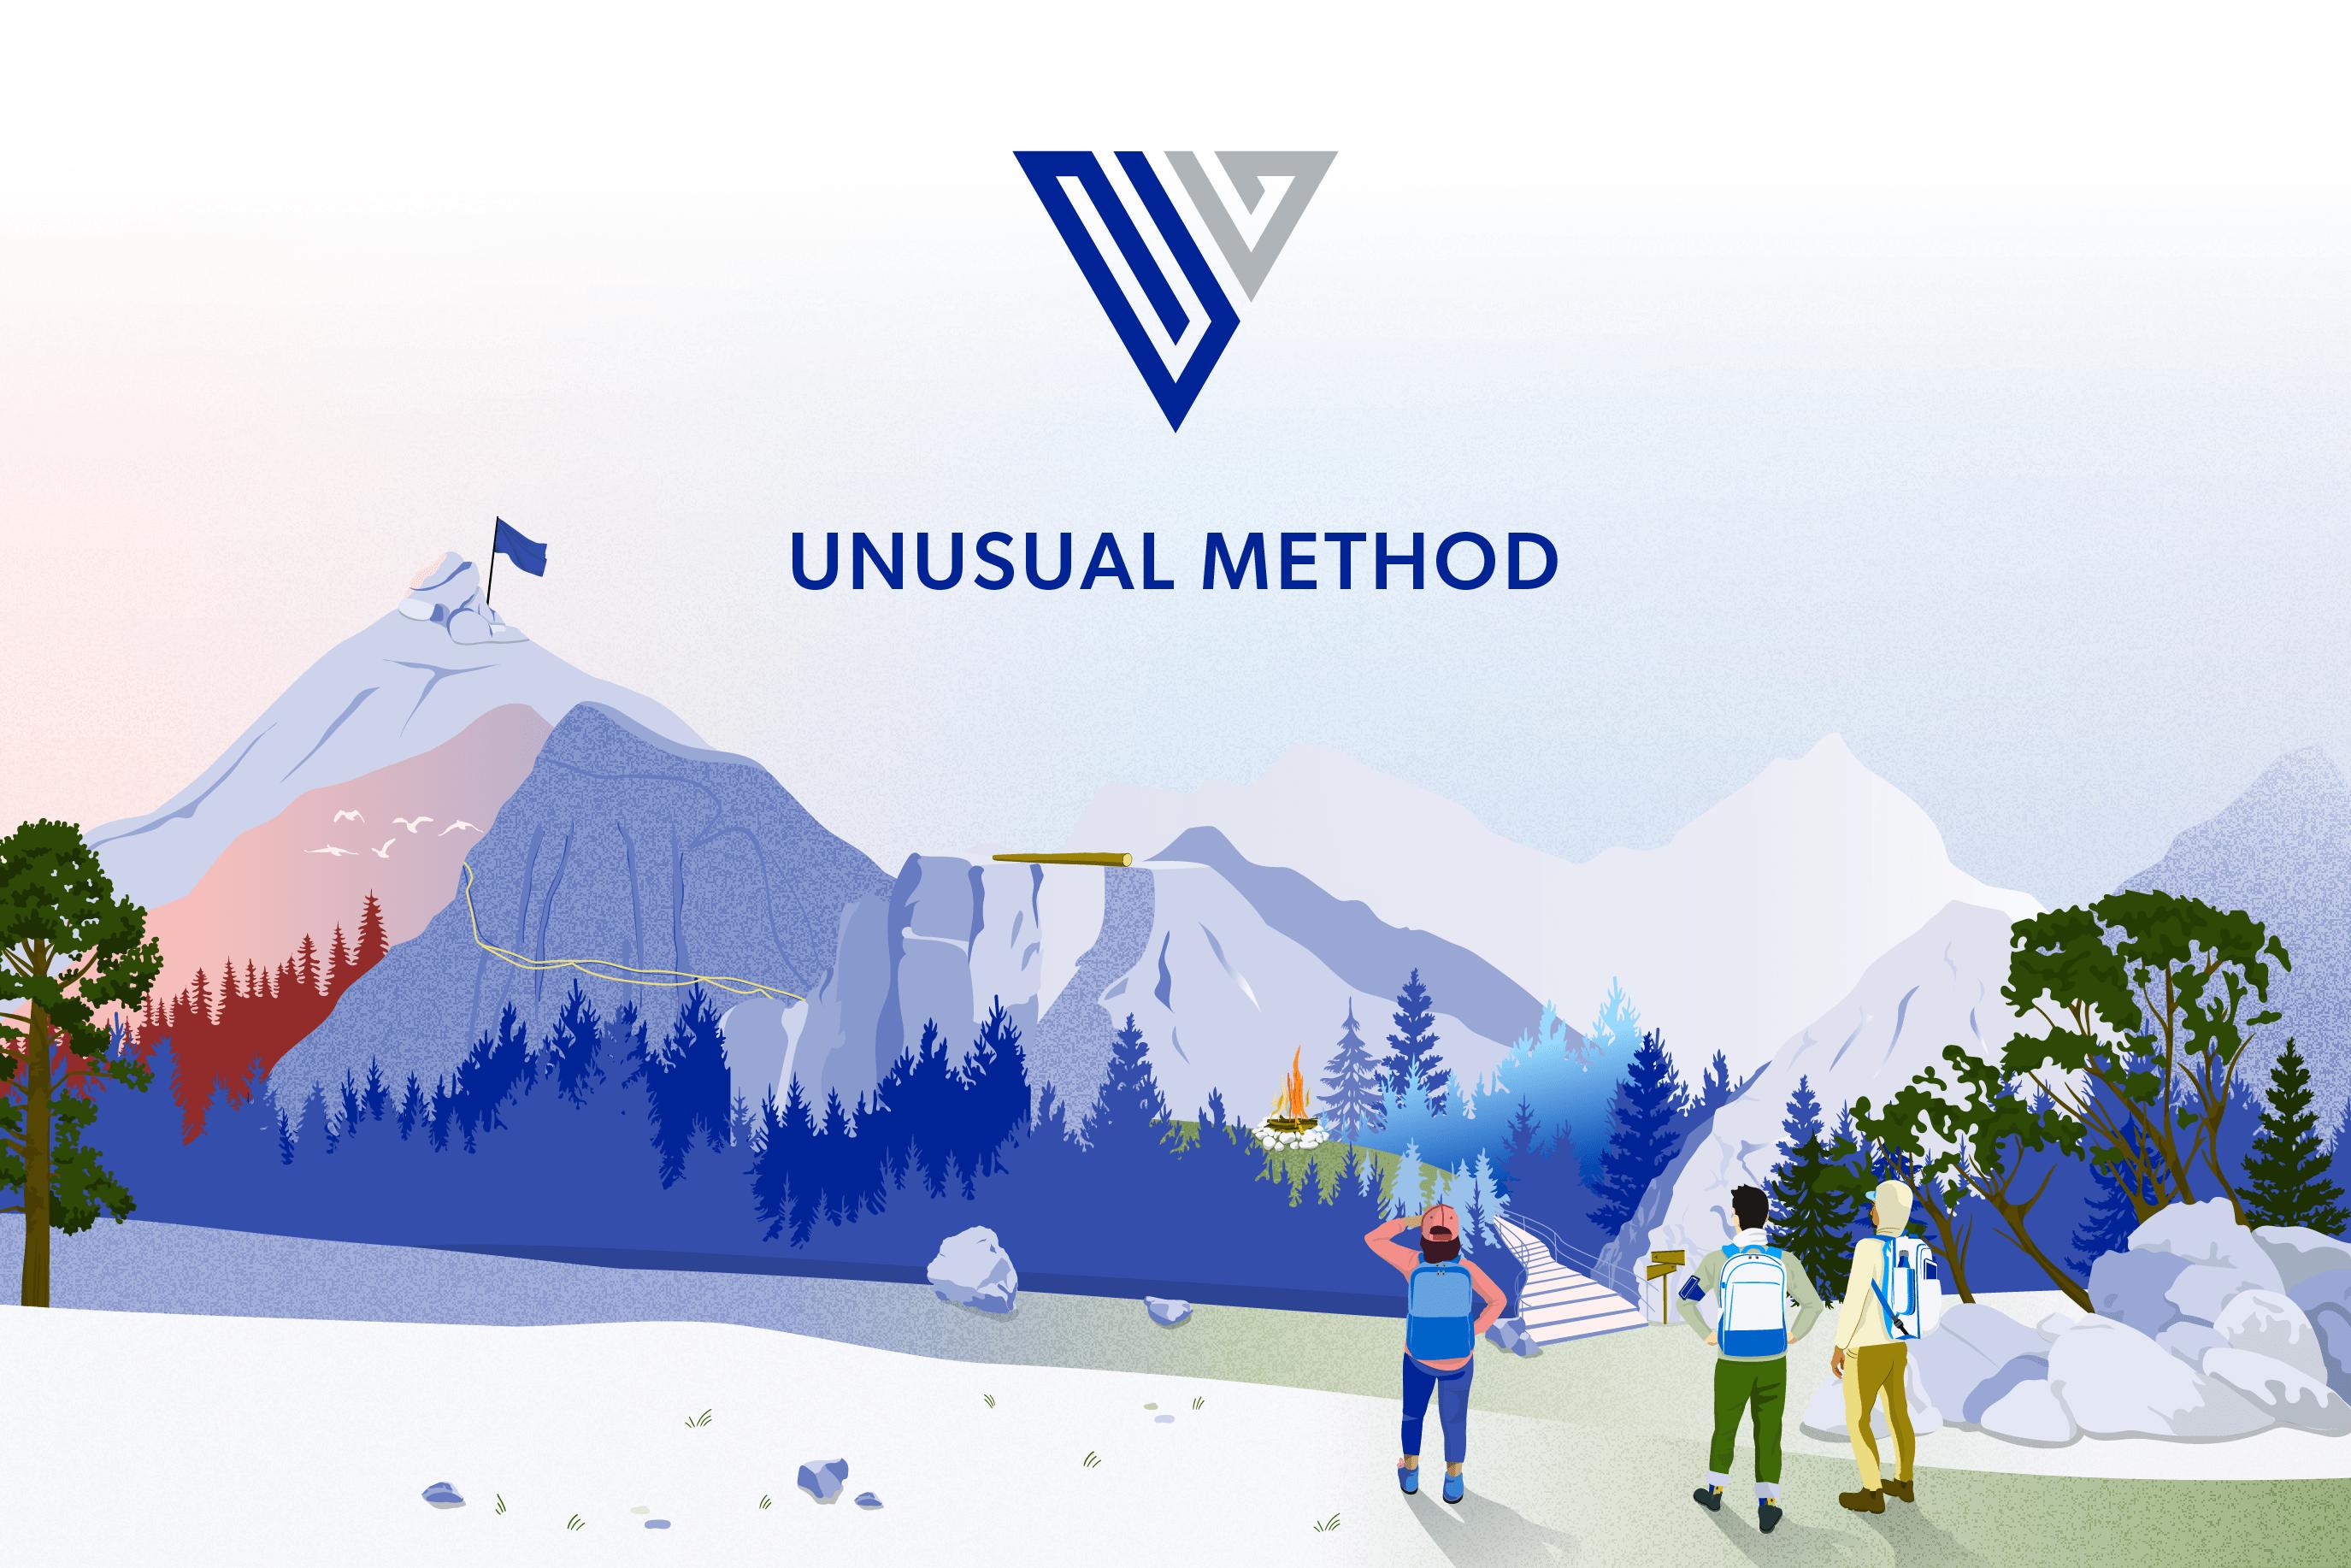 Introducing The Unusual Method